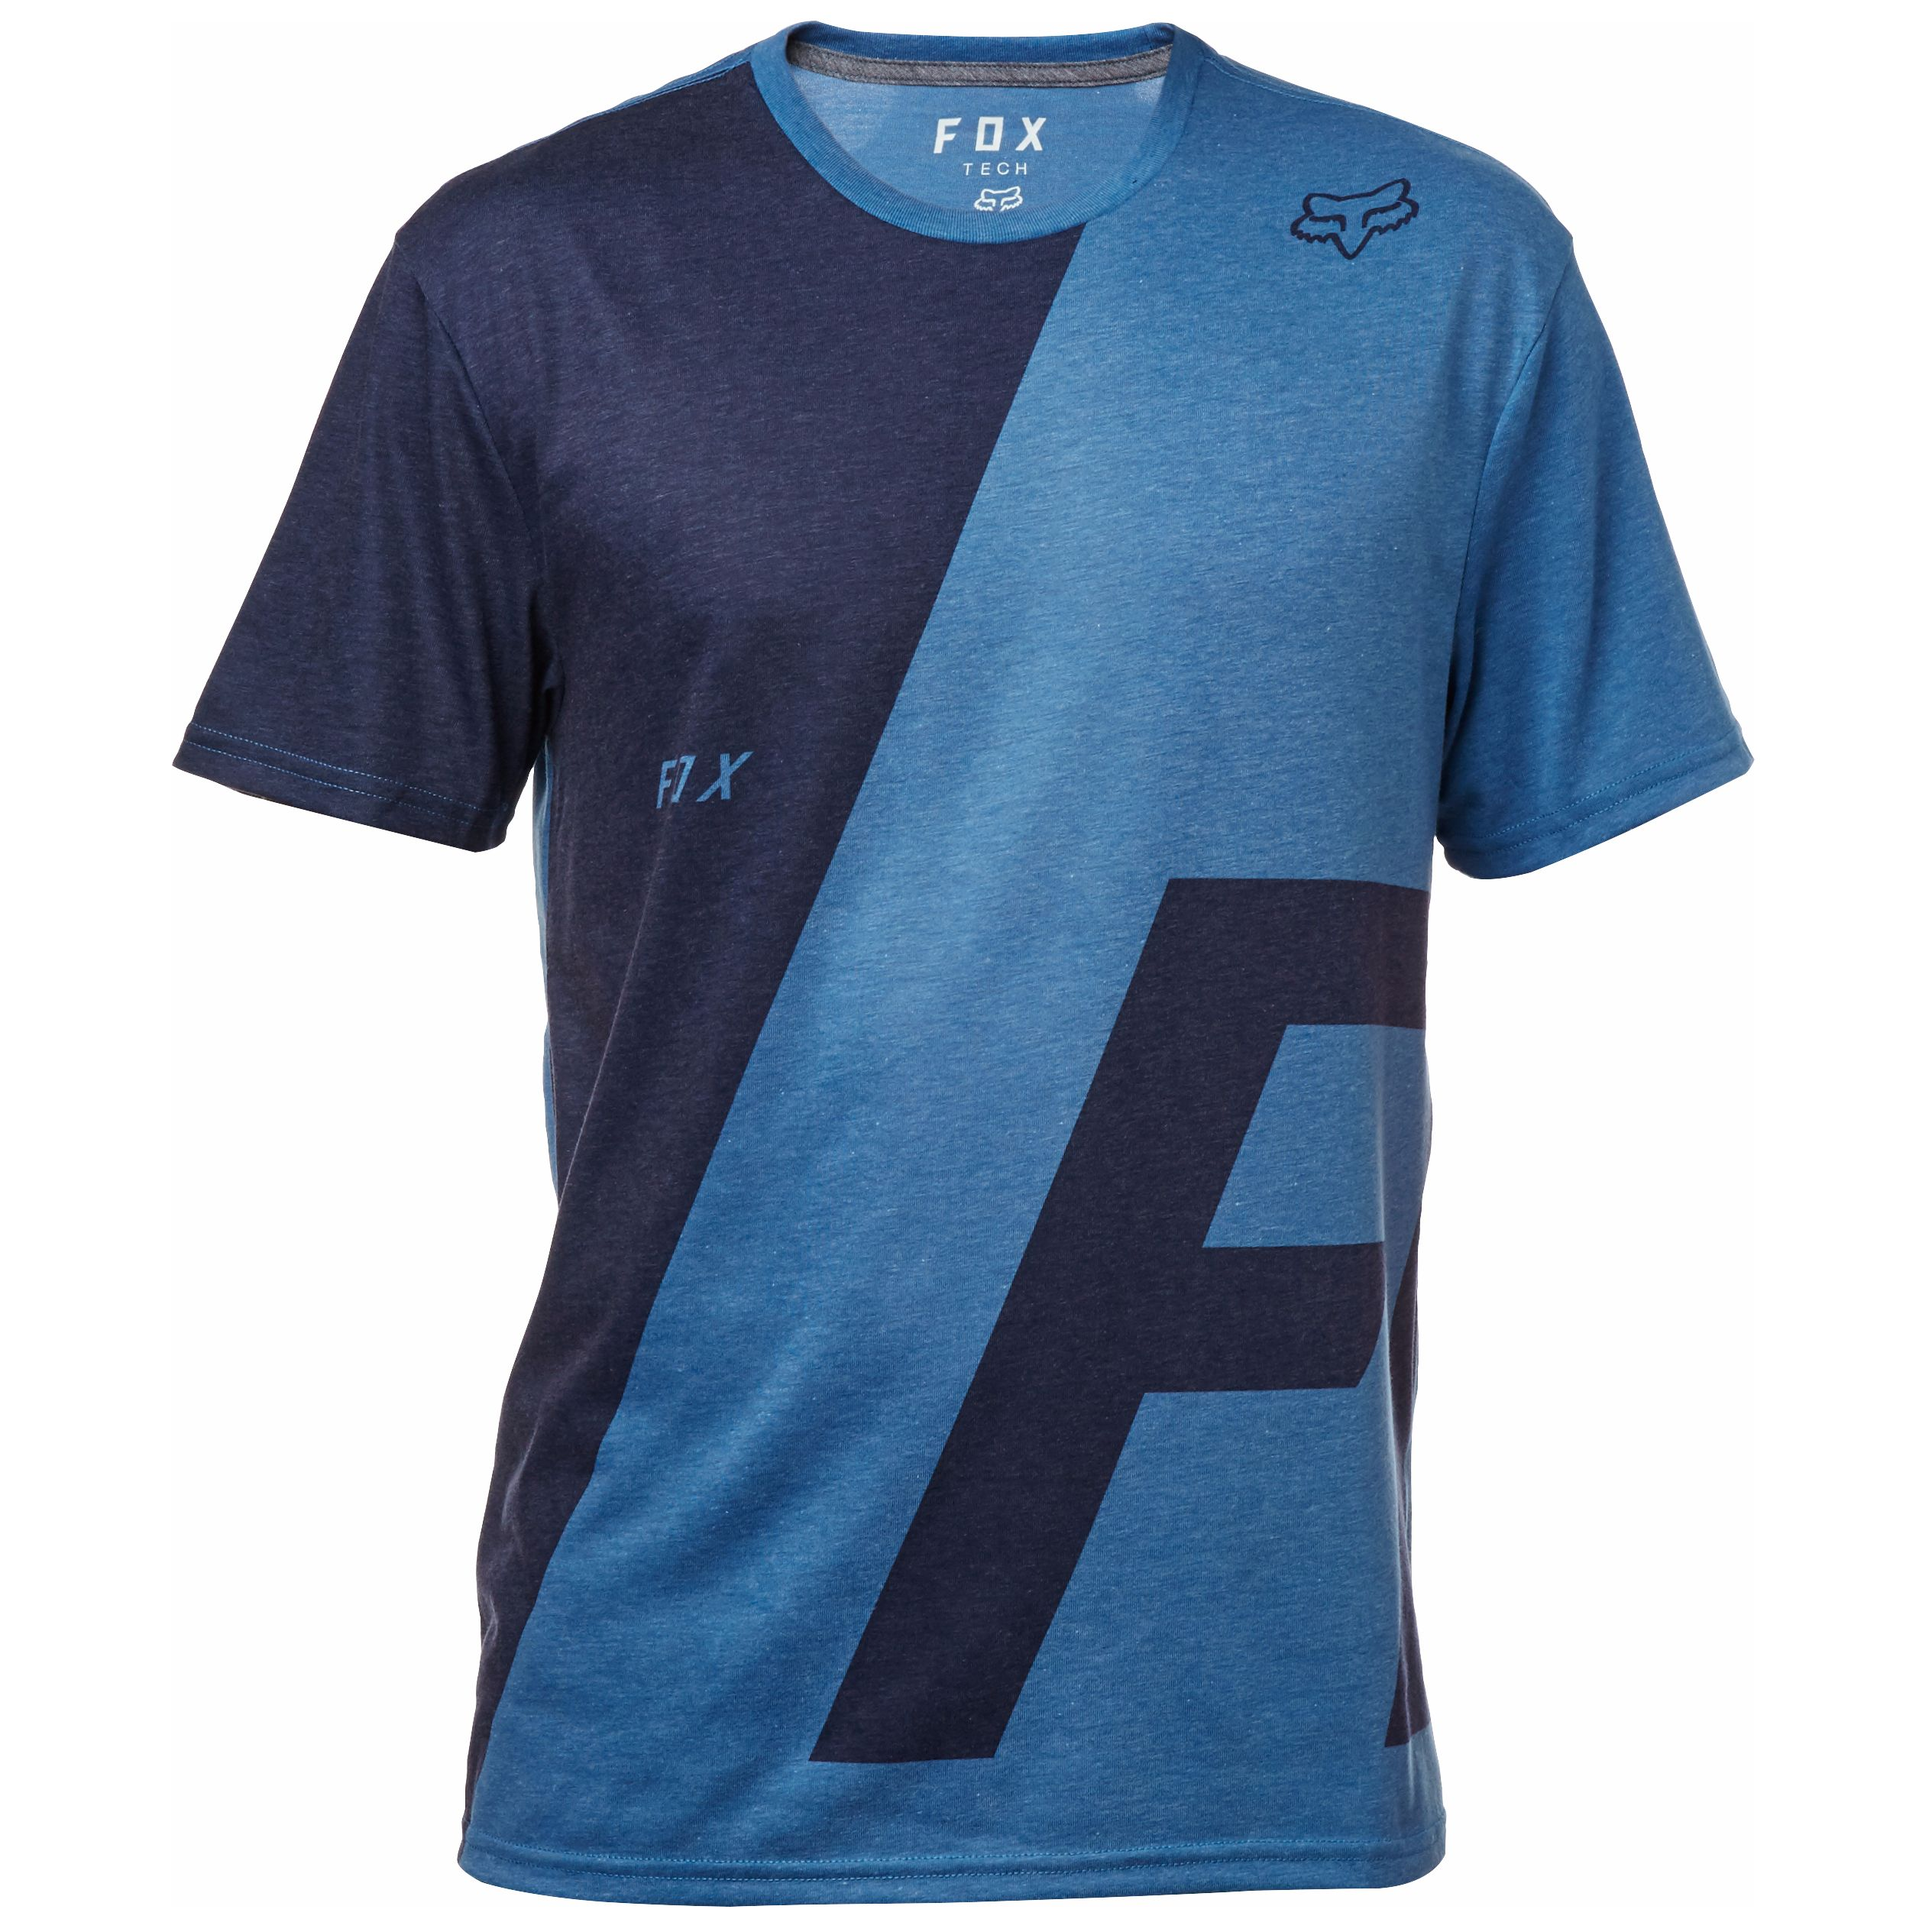 T-shirt Manches Courtes Fox Inverter - 2018